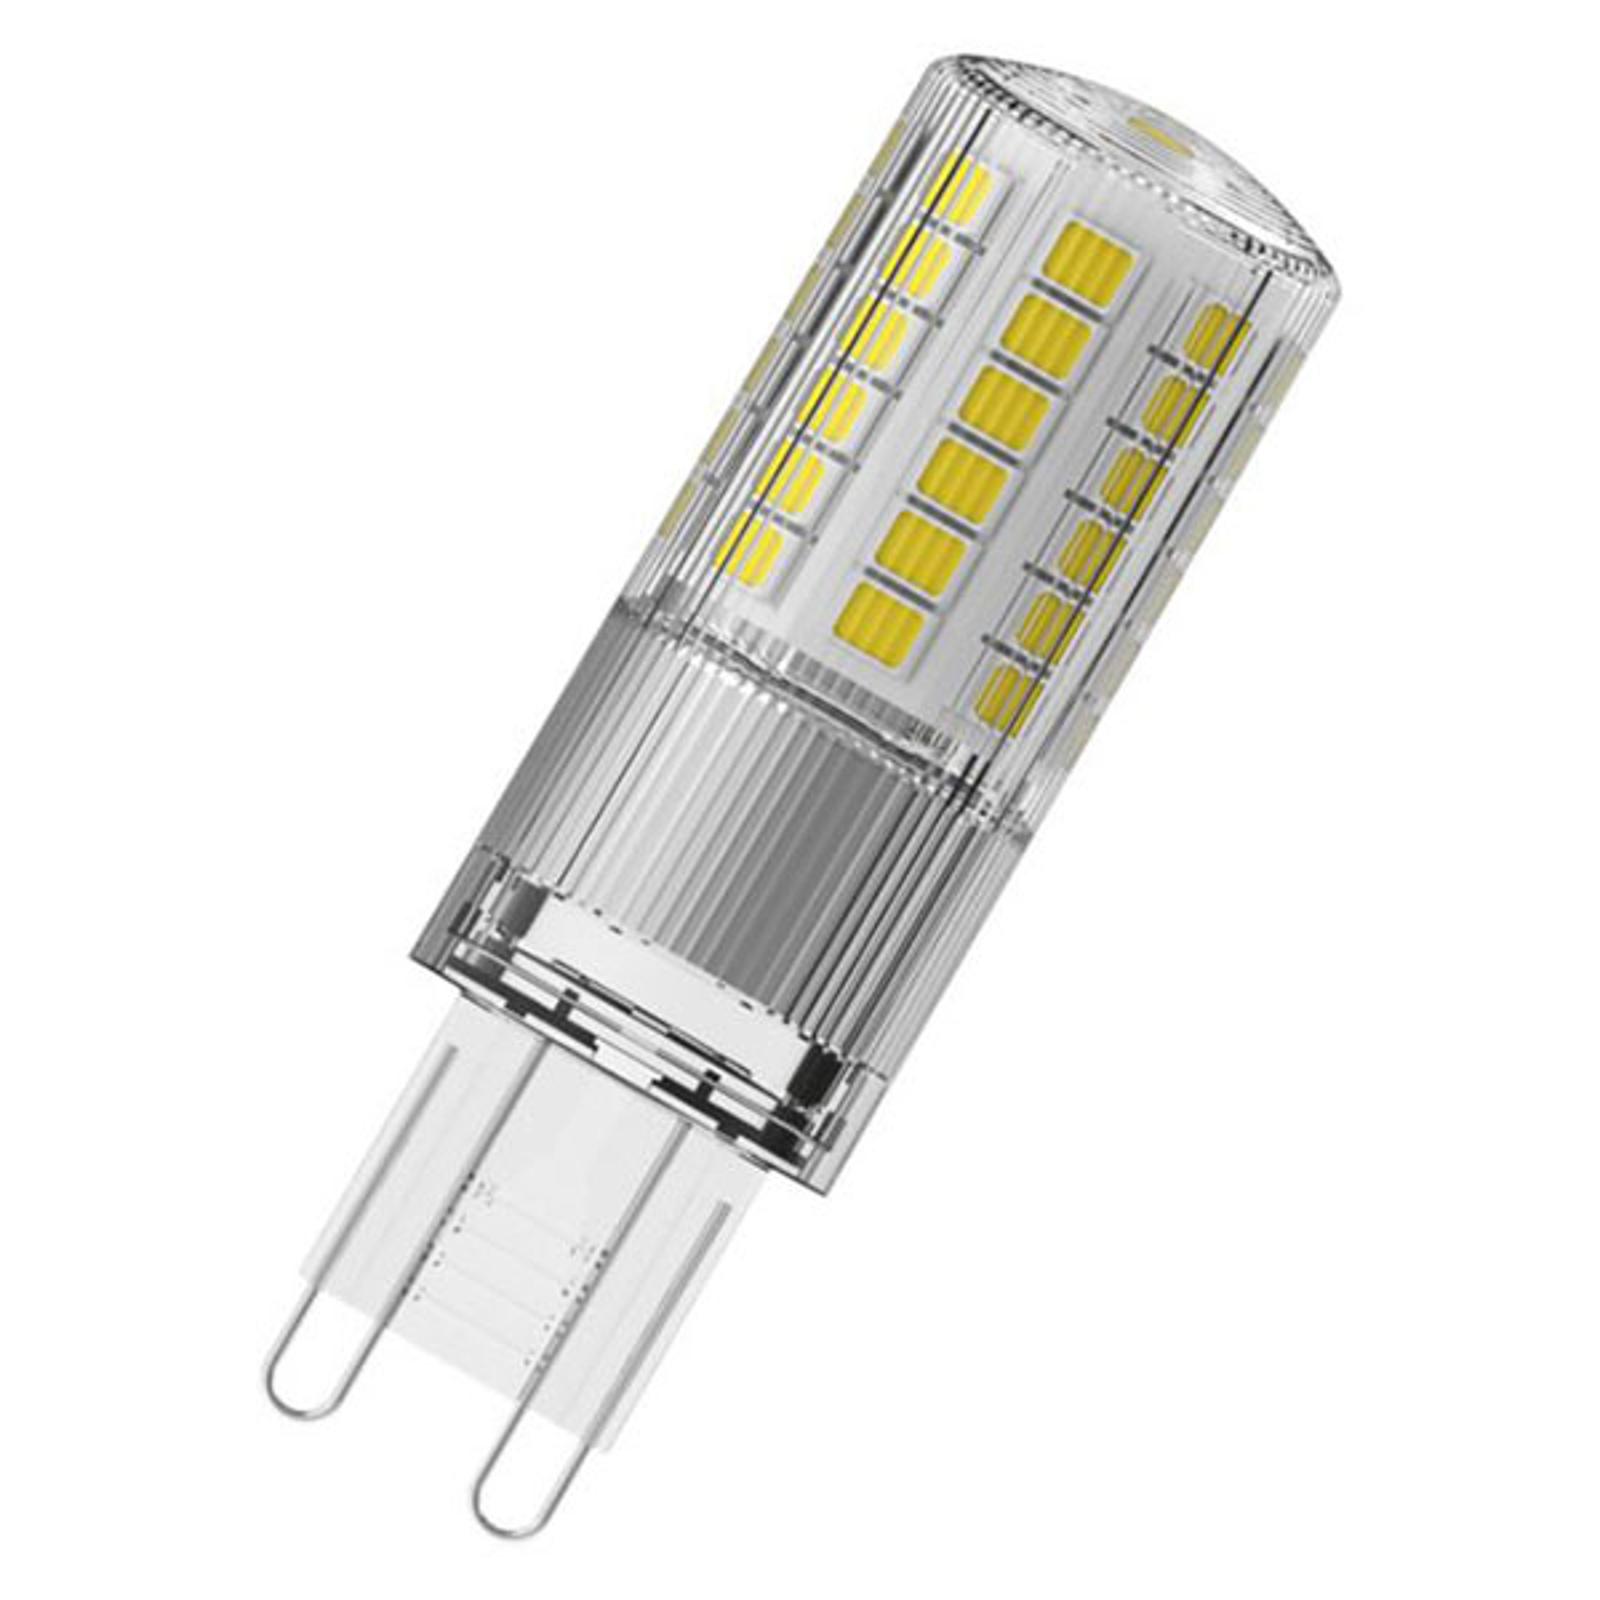 OSRAM ampoule LED G9 4W 2700K transp 3-Step-dim